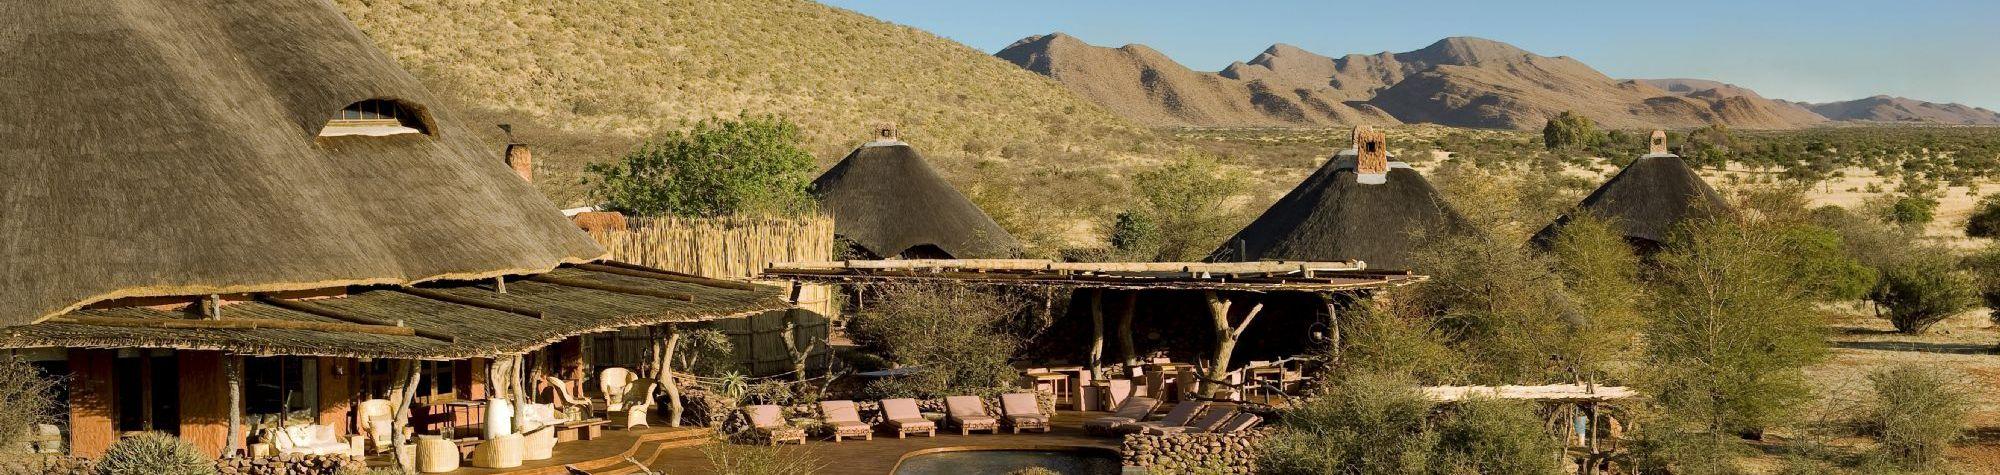 The Motse, Tswalu Kalahari Reserve